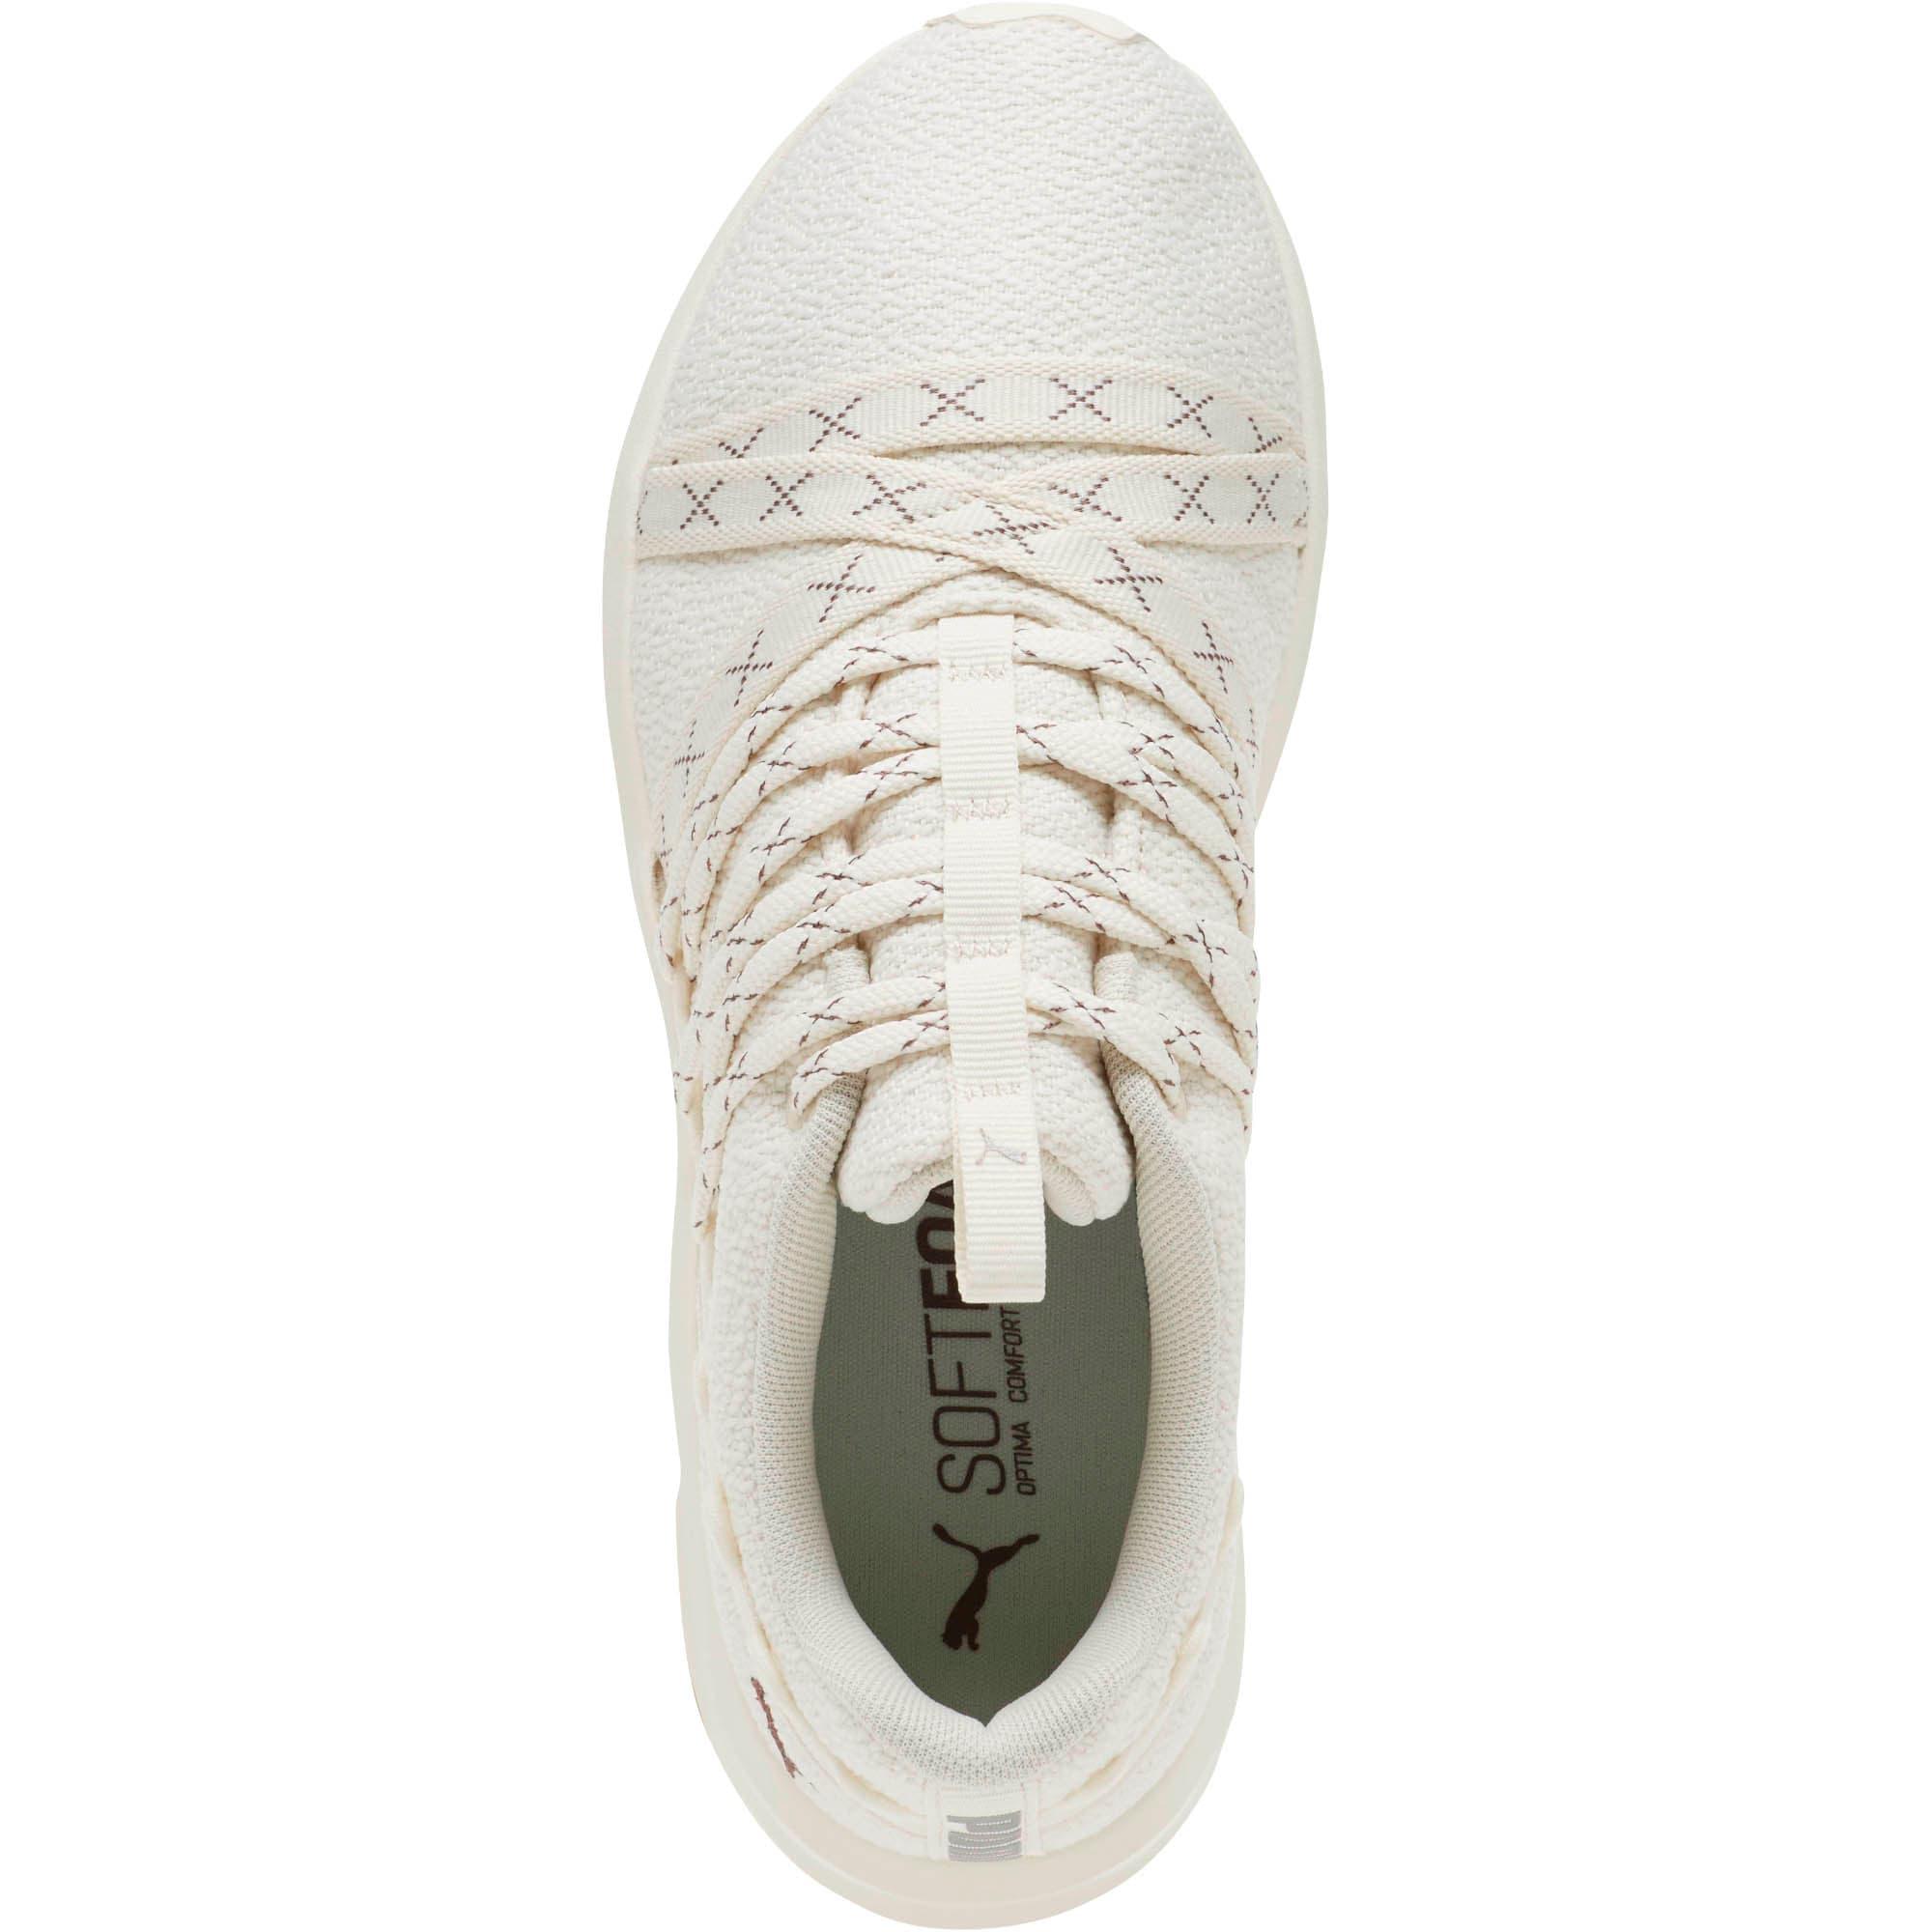 Thumbnail 5 of Prowl Alt 2 LX Women's Training Shoes, Whisper White, medium